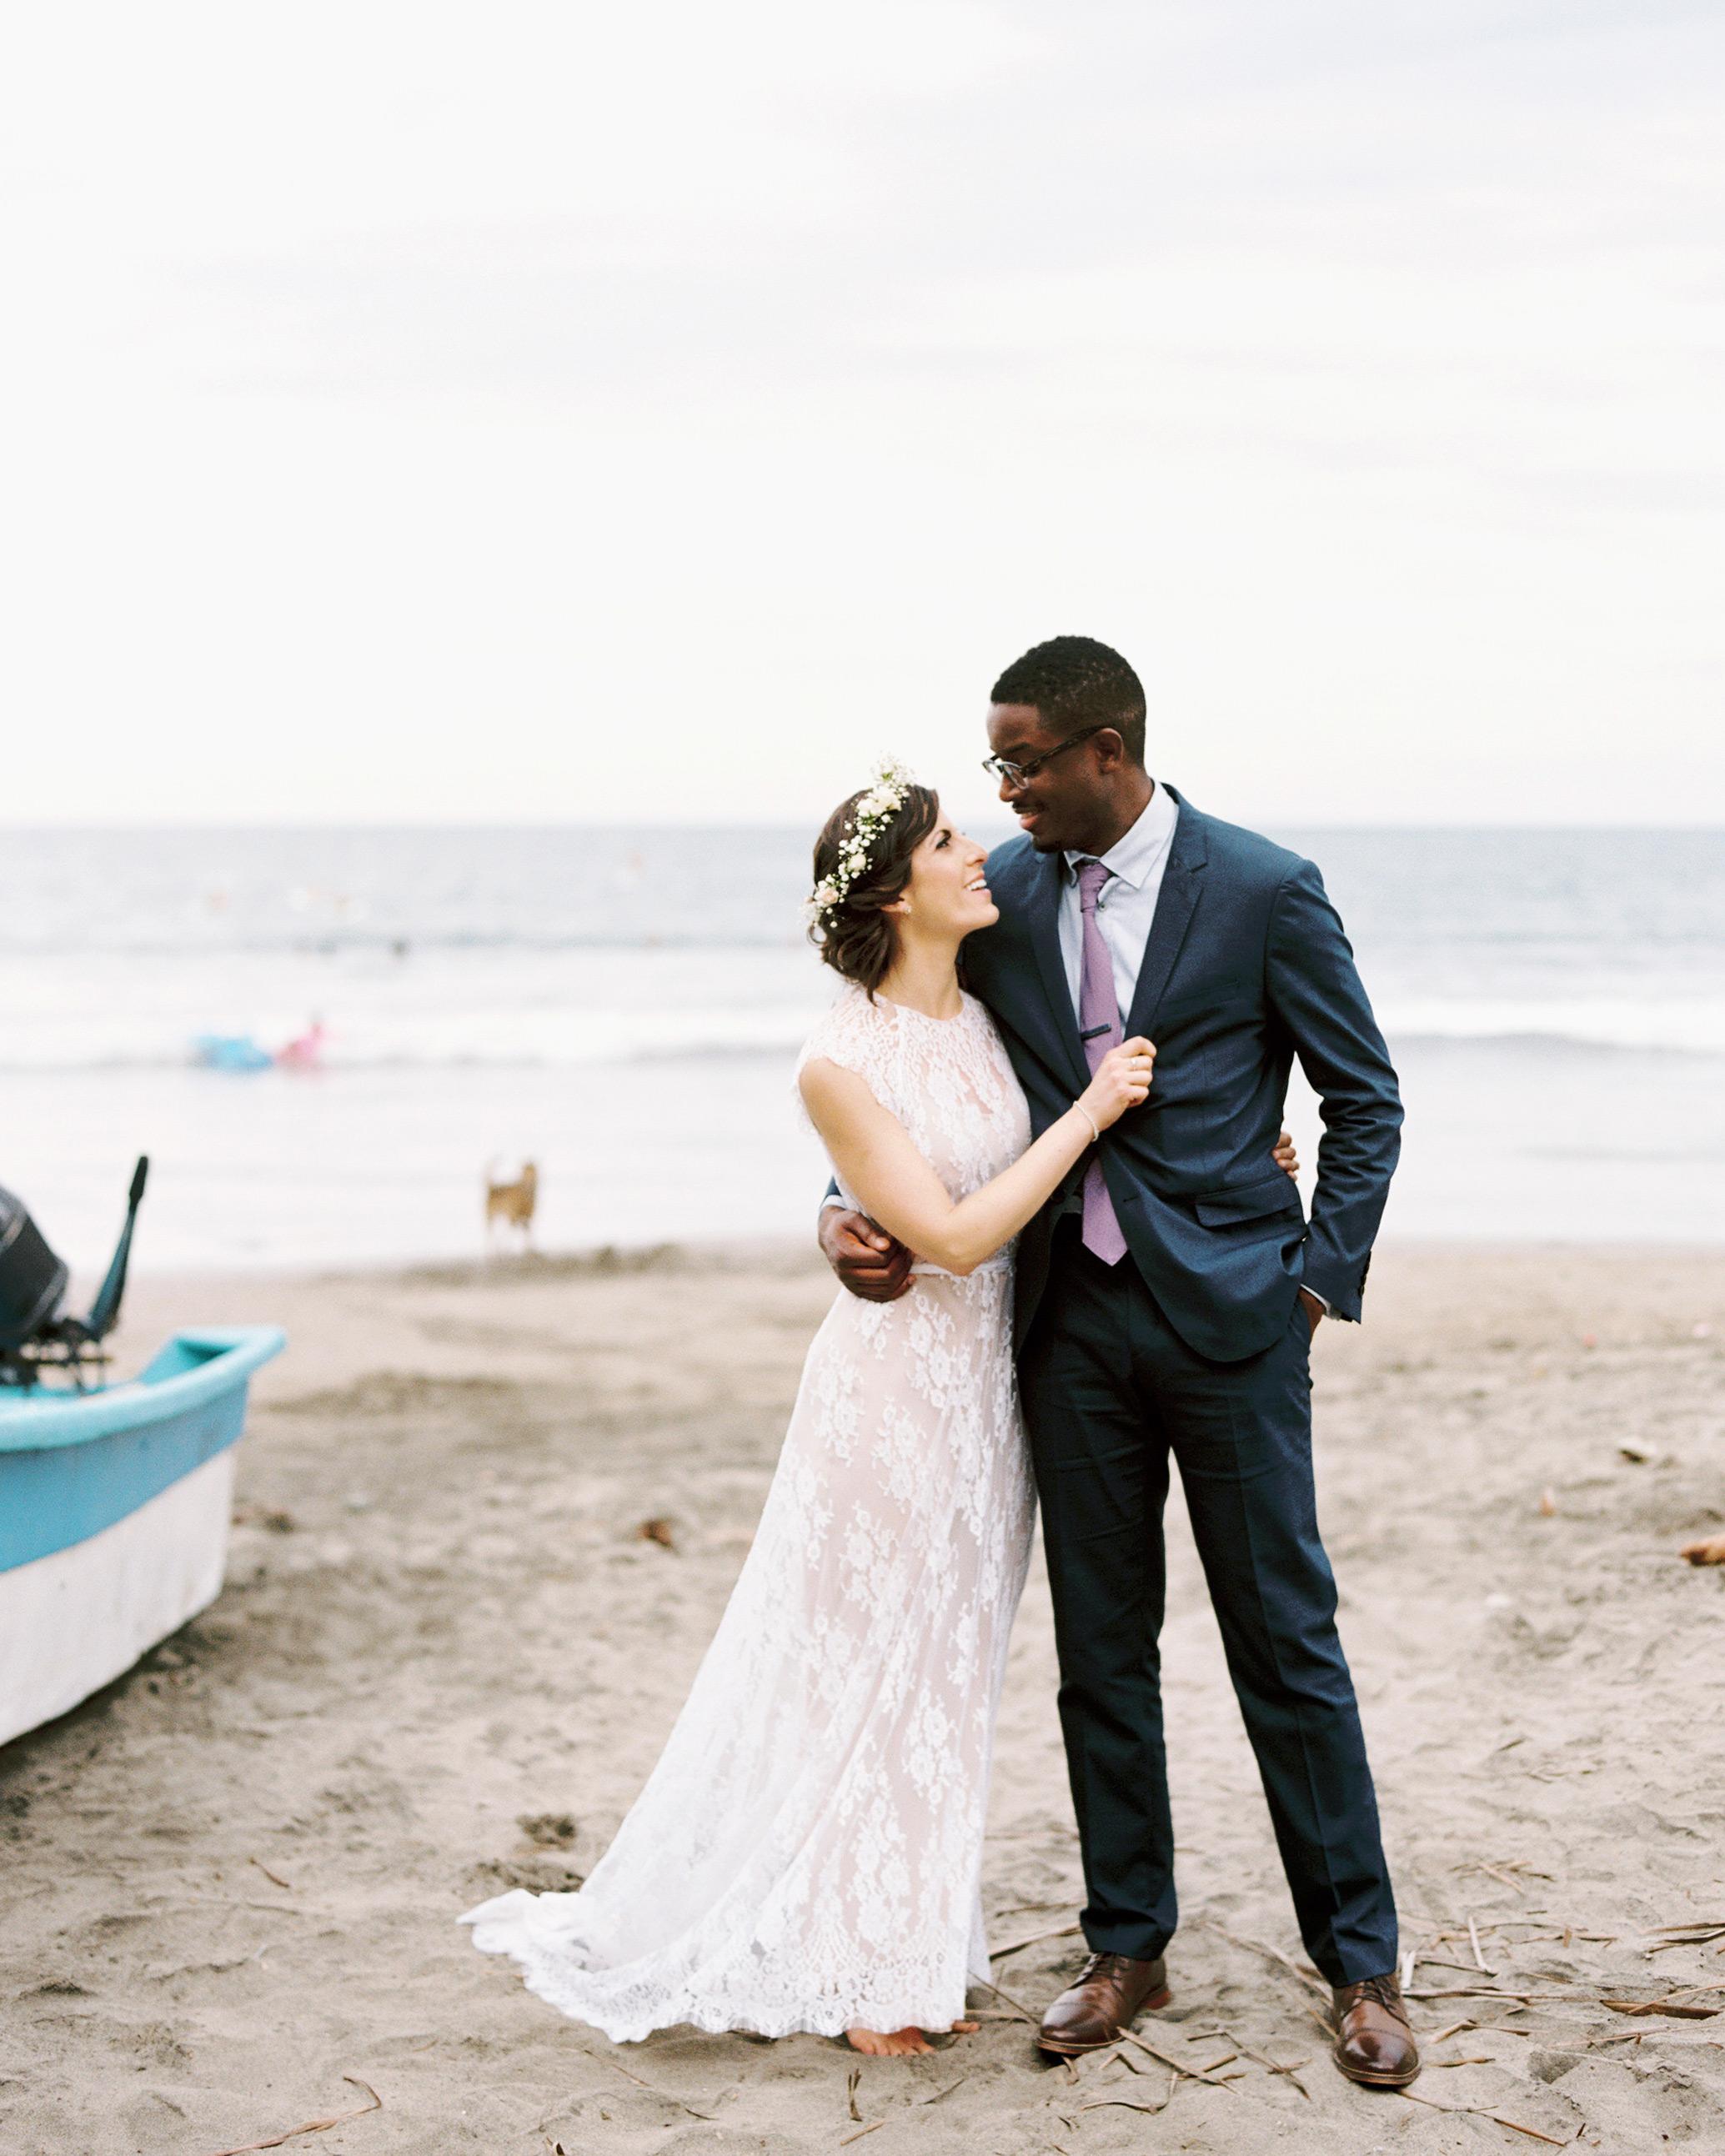 rebecca-eji-wedding-couple-306-s113057-0616.jpg